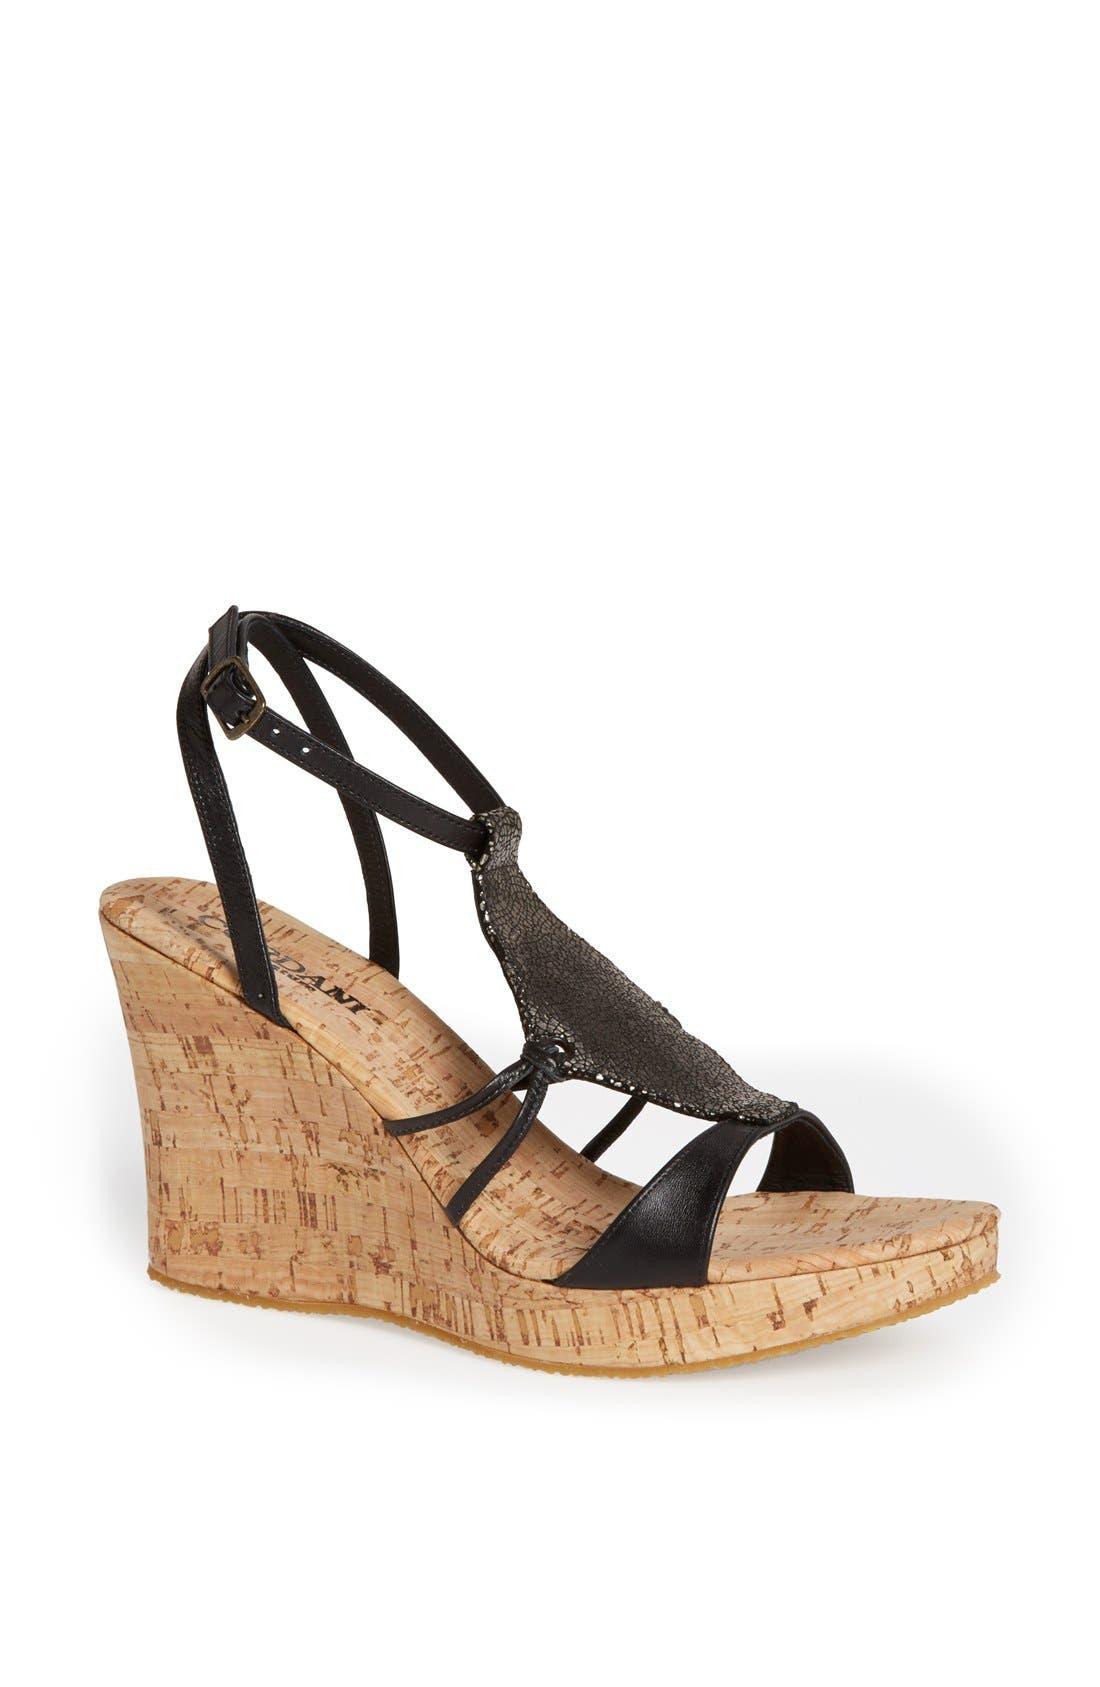 Main Image - Cordani 'Weasy' Sandal